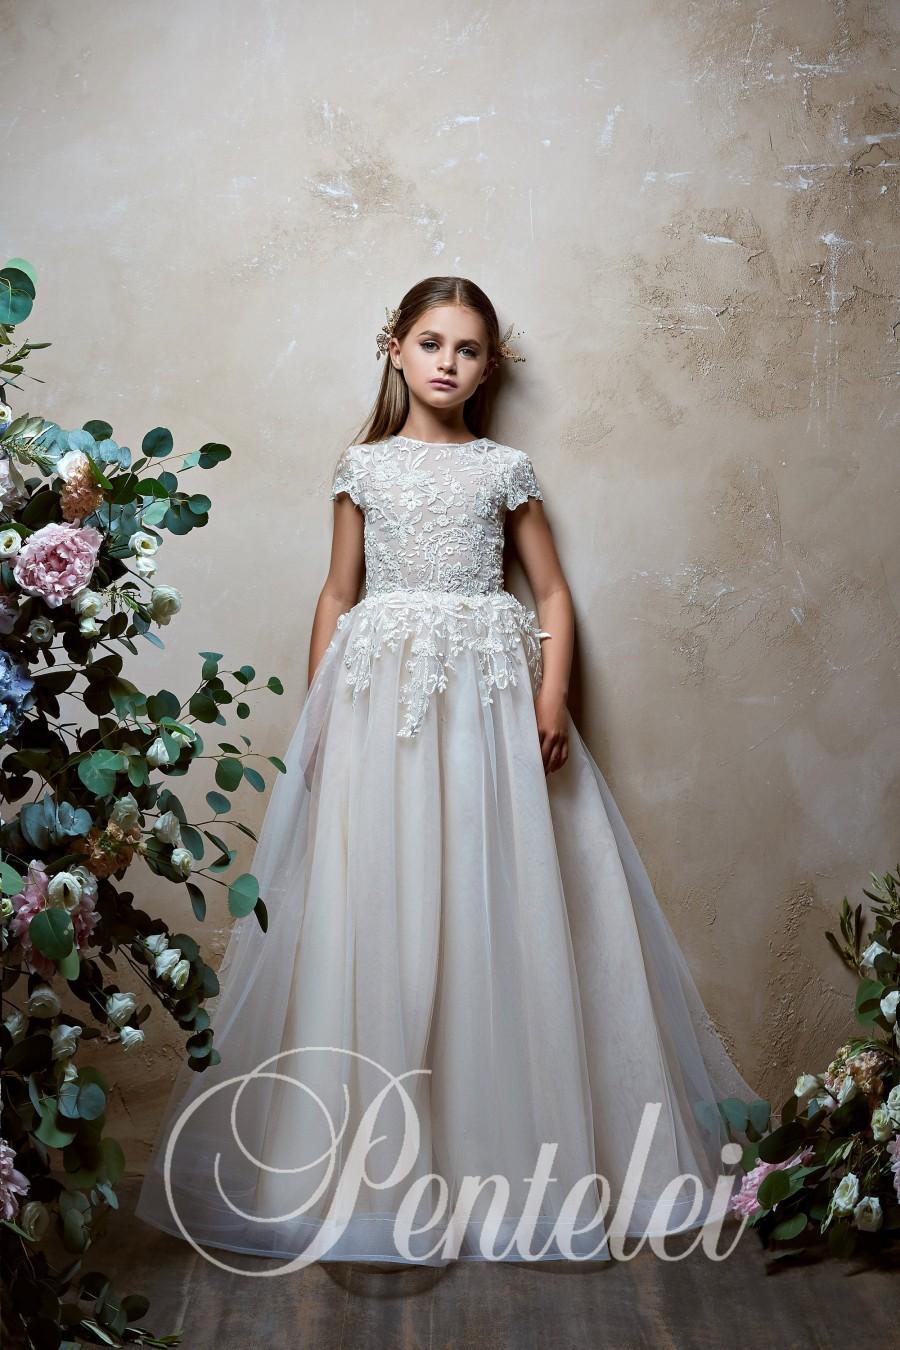 Wedding - First Communion Dress,White flower girl dress,Baptism Dress,Baby toddler lace dress,flower girls dresses,flower girl dress,Quinceanera Dress